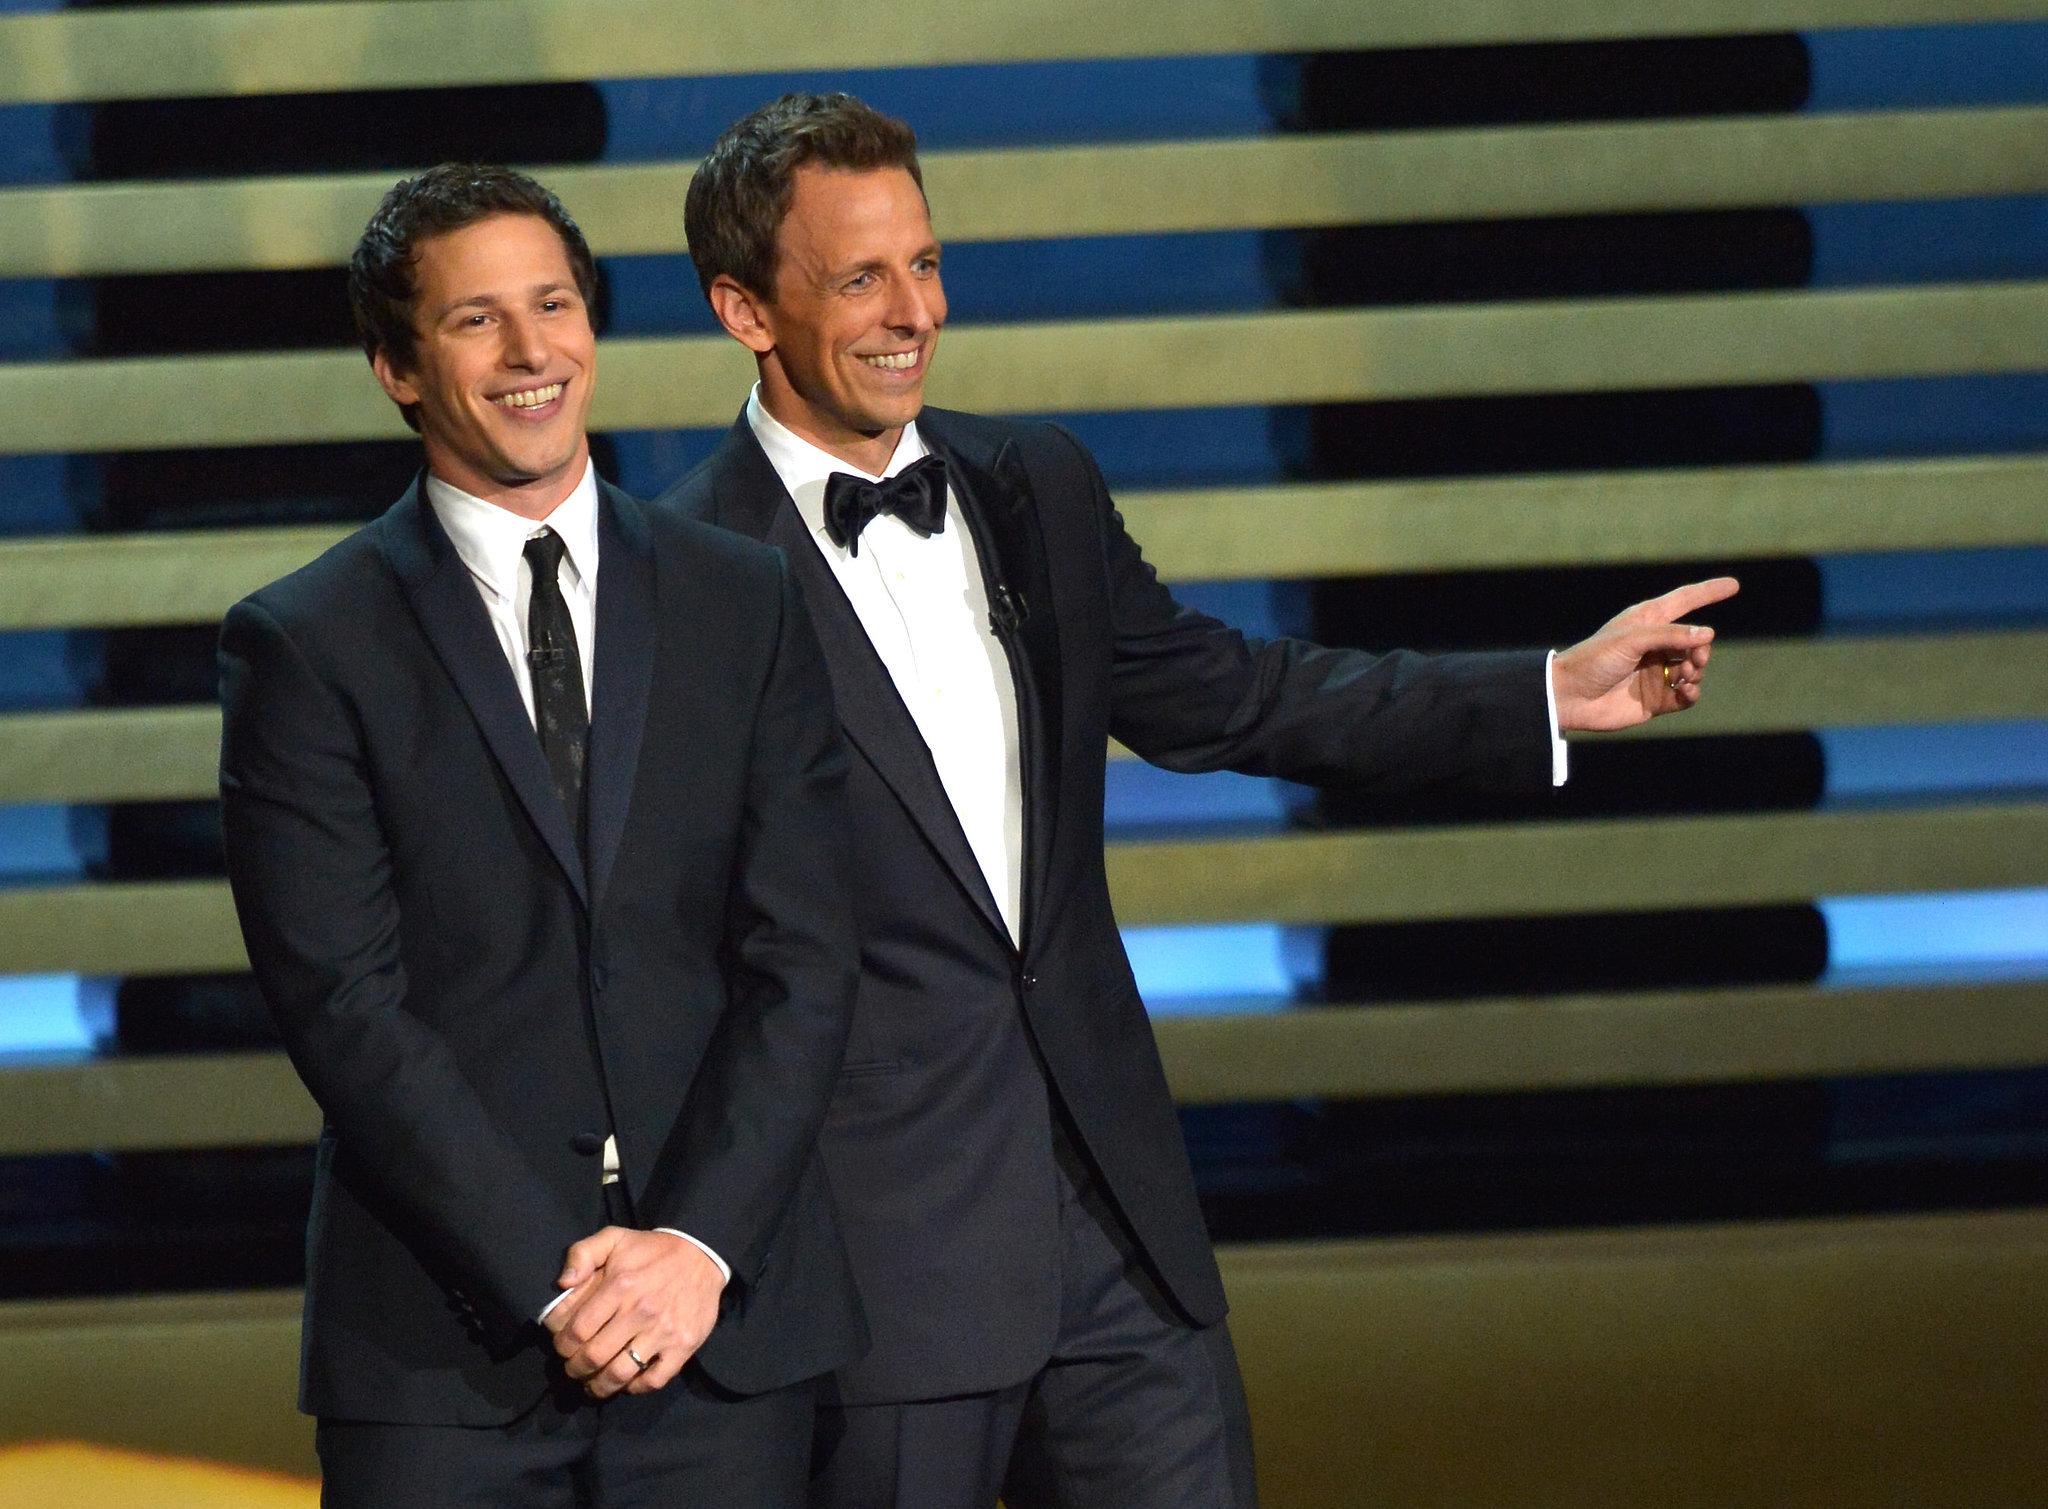 Andy Samberg and Seth Meyers joked around on stage.